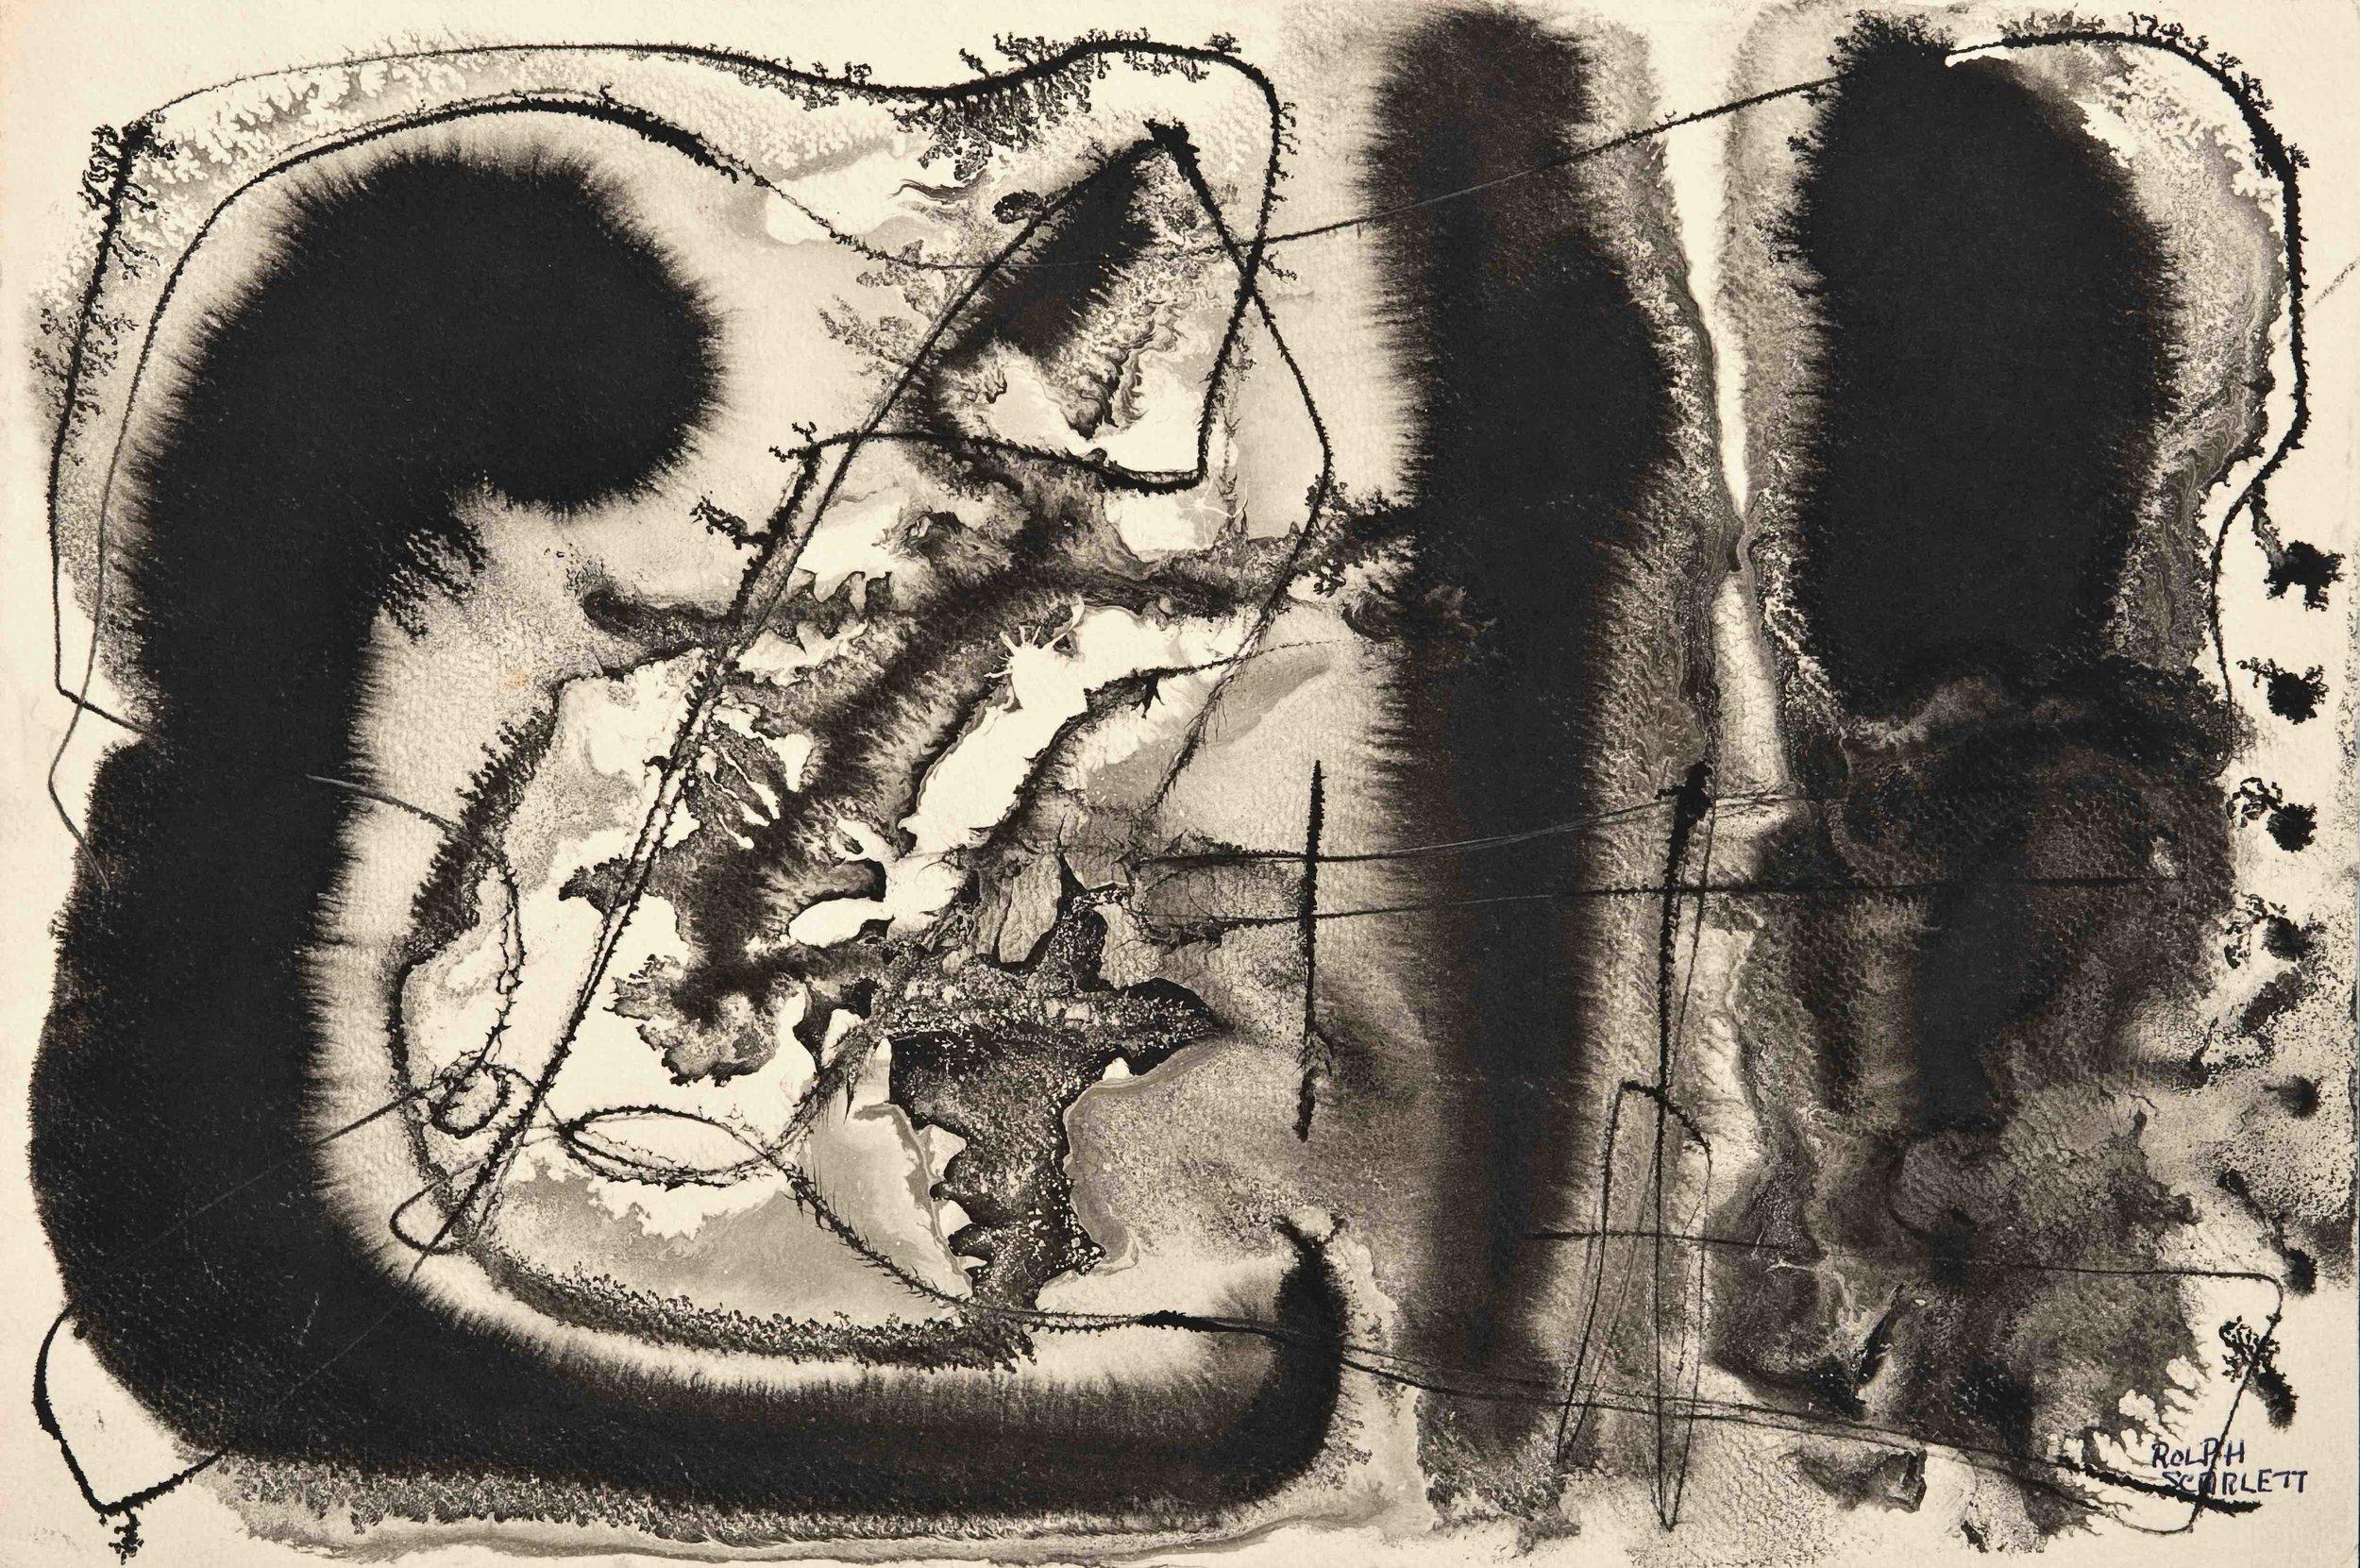 "Rolph Scarlett,  (RS177),  c. 1949, ink on paper, 22 1/2 x 28"" framed"